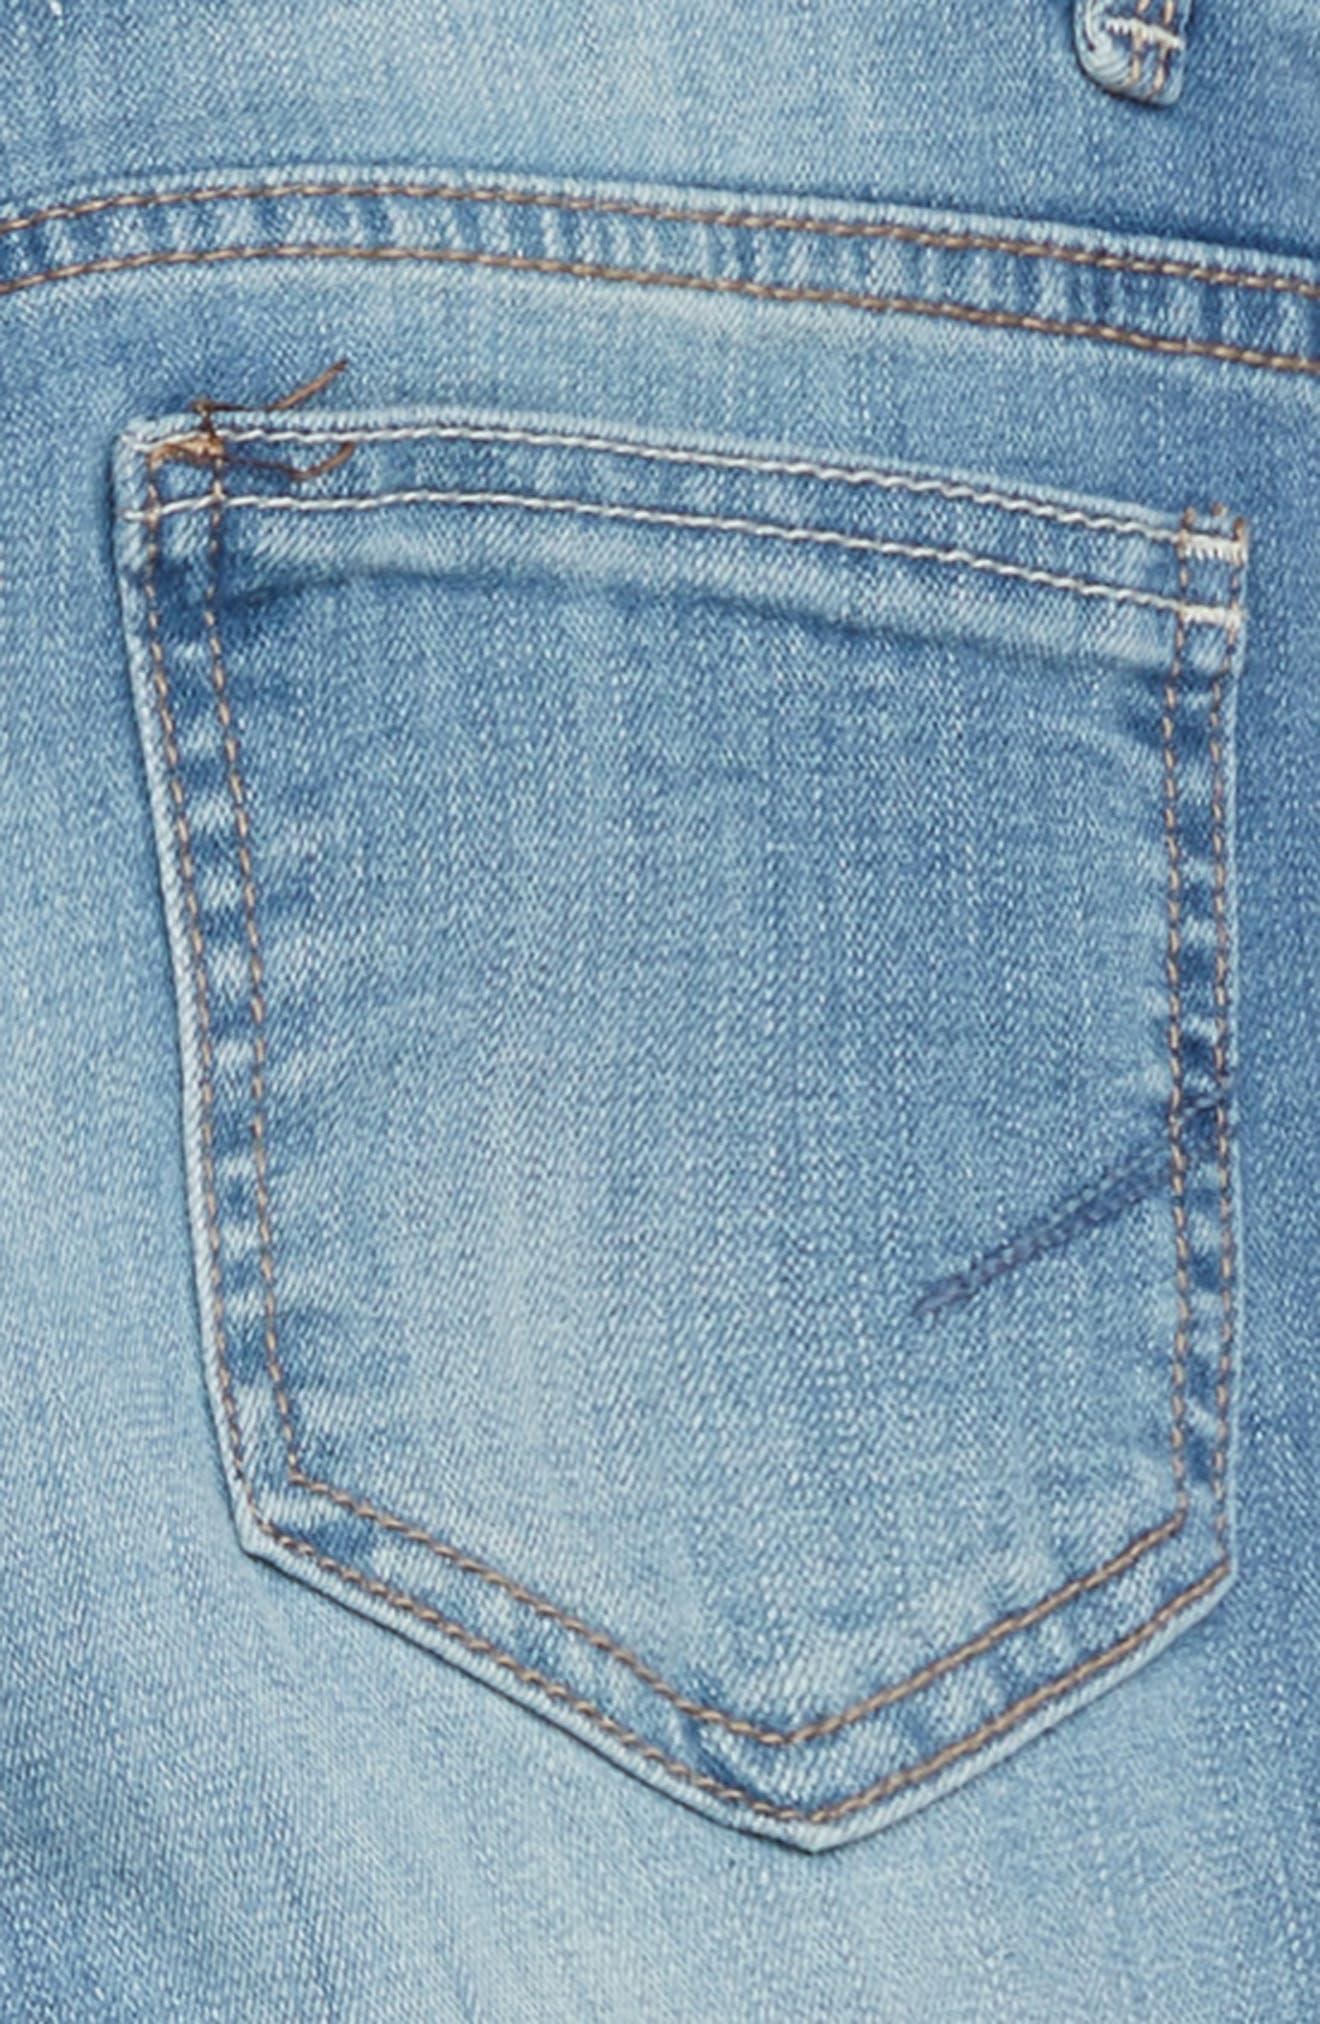 Skinny Jeans,                             Alternate thumbnail 3, color,                             Light Stone